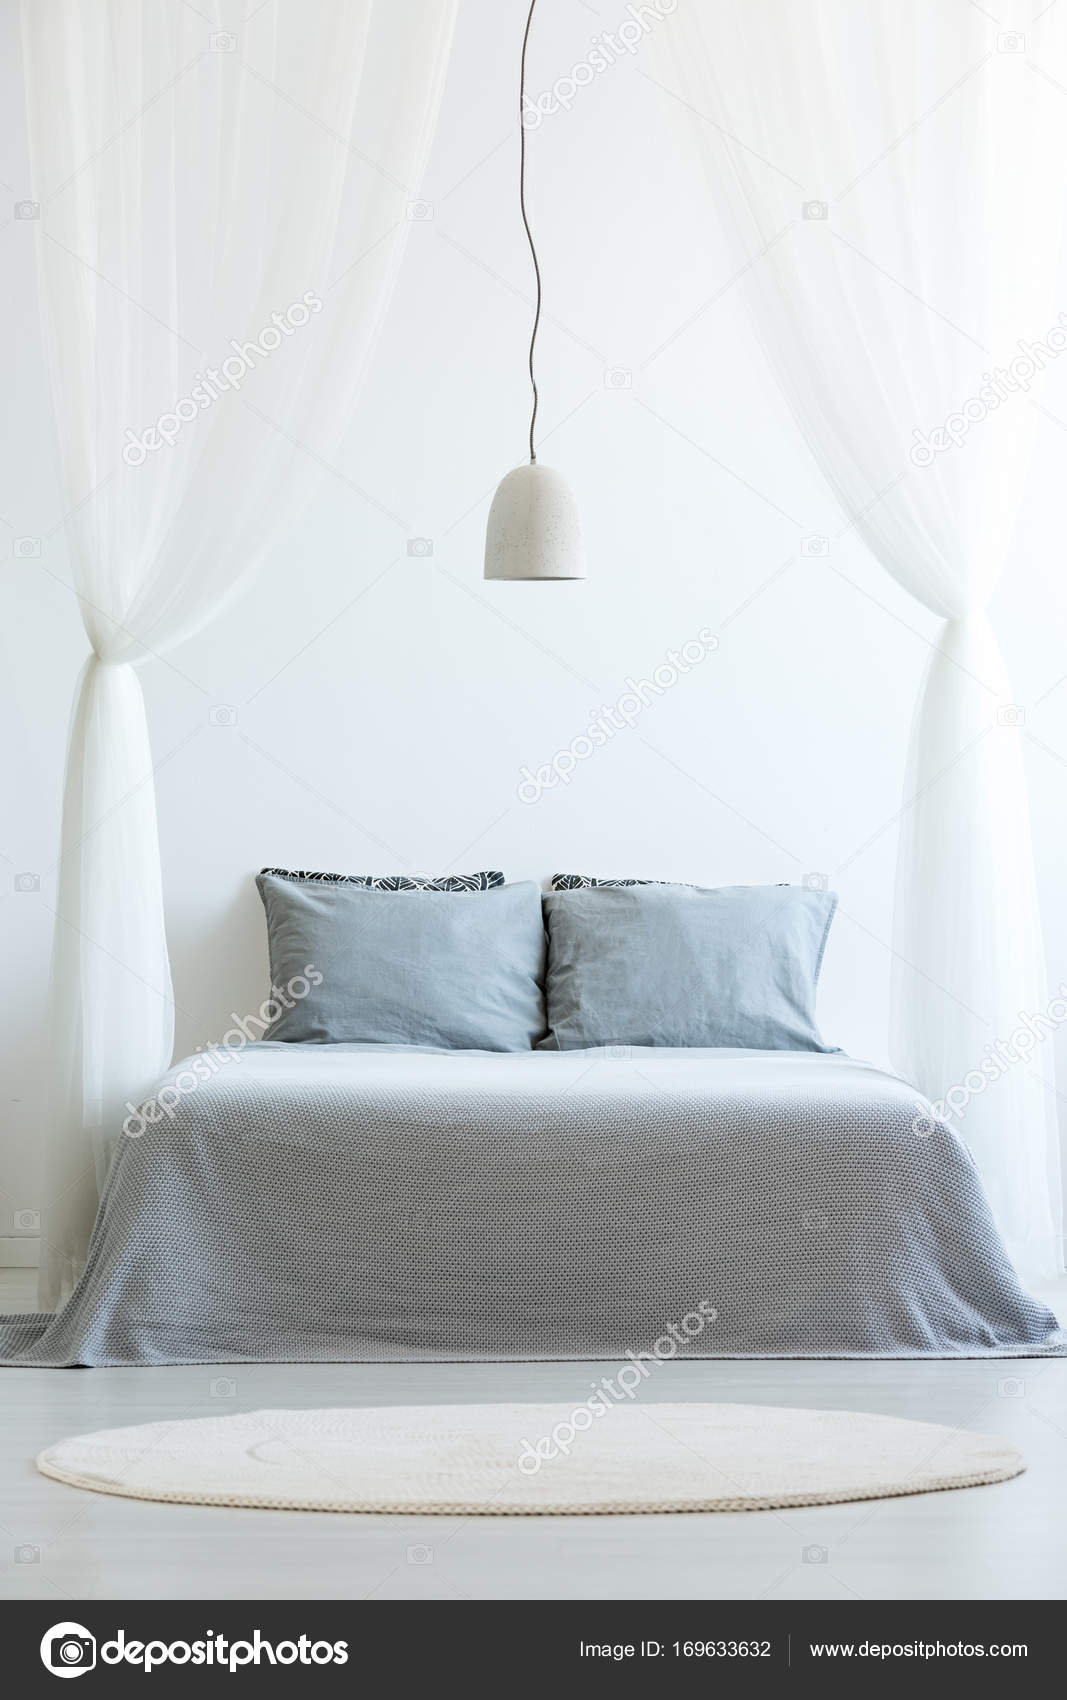 Vorderansicht Des Baldachin Bett Stockfoto C Photographee Eu